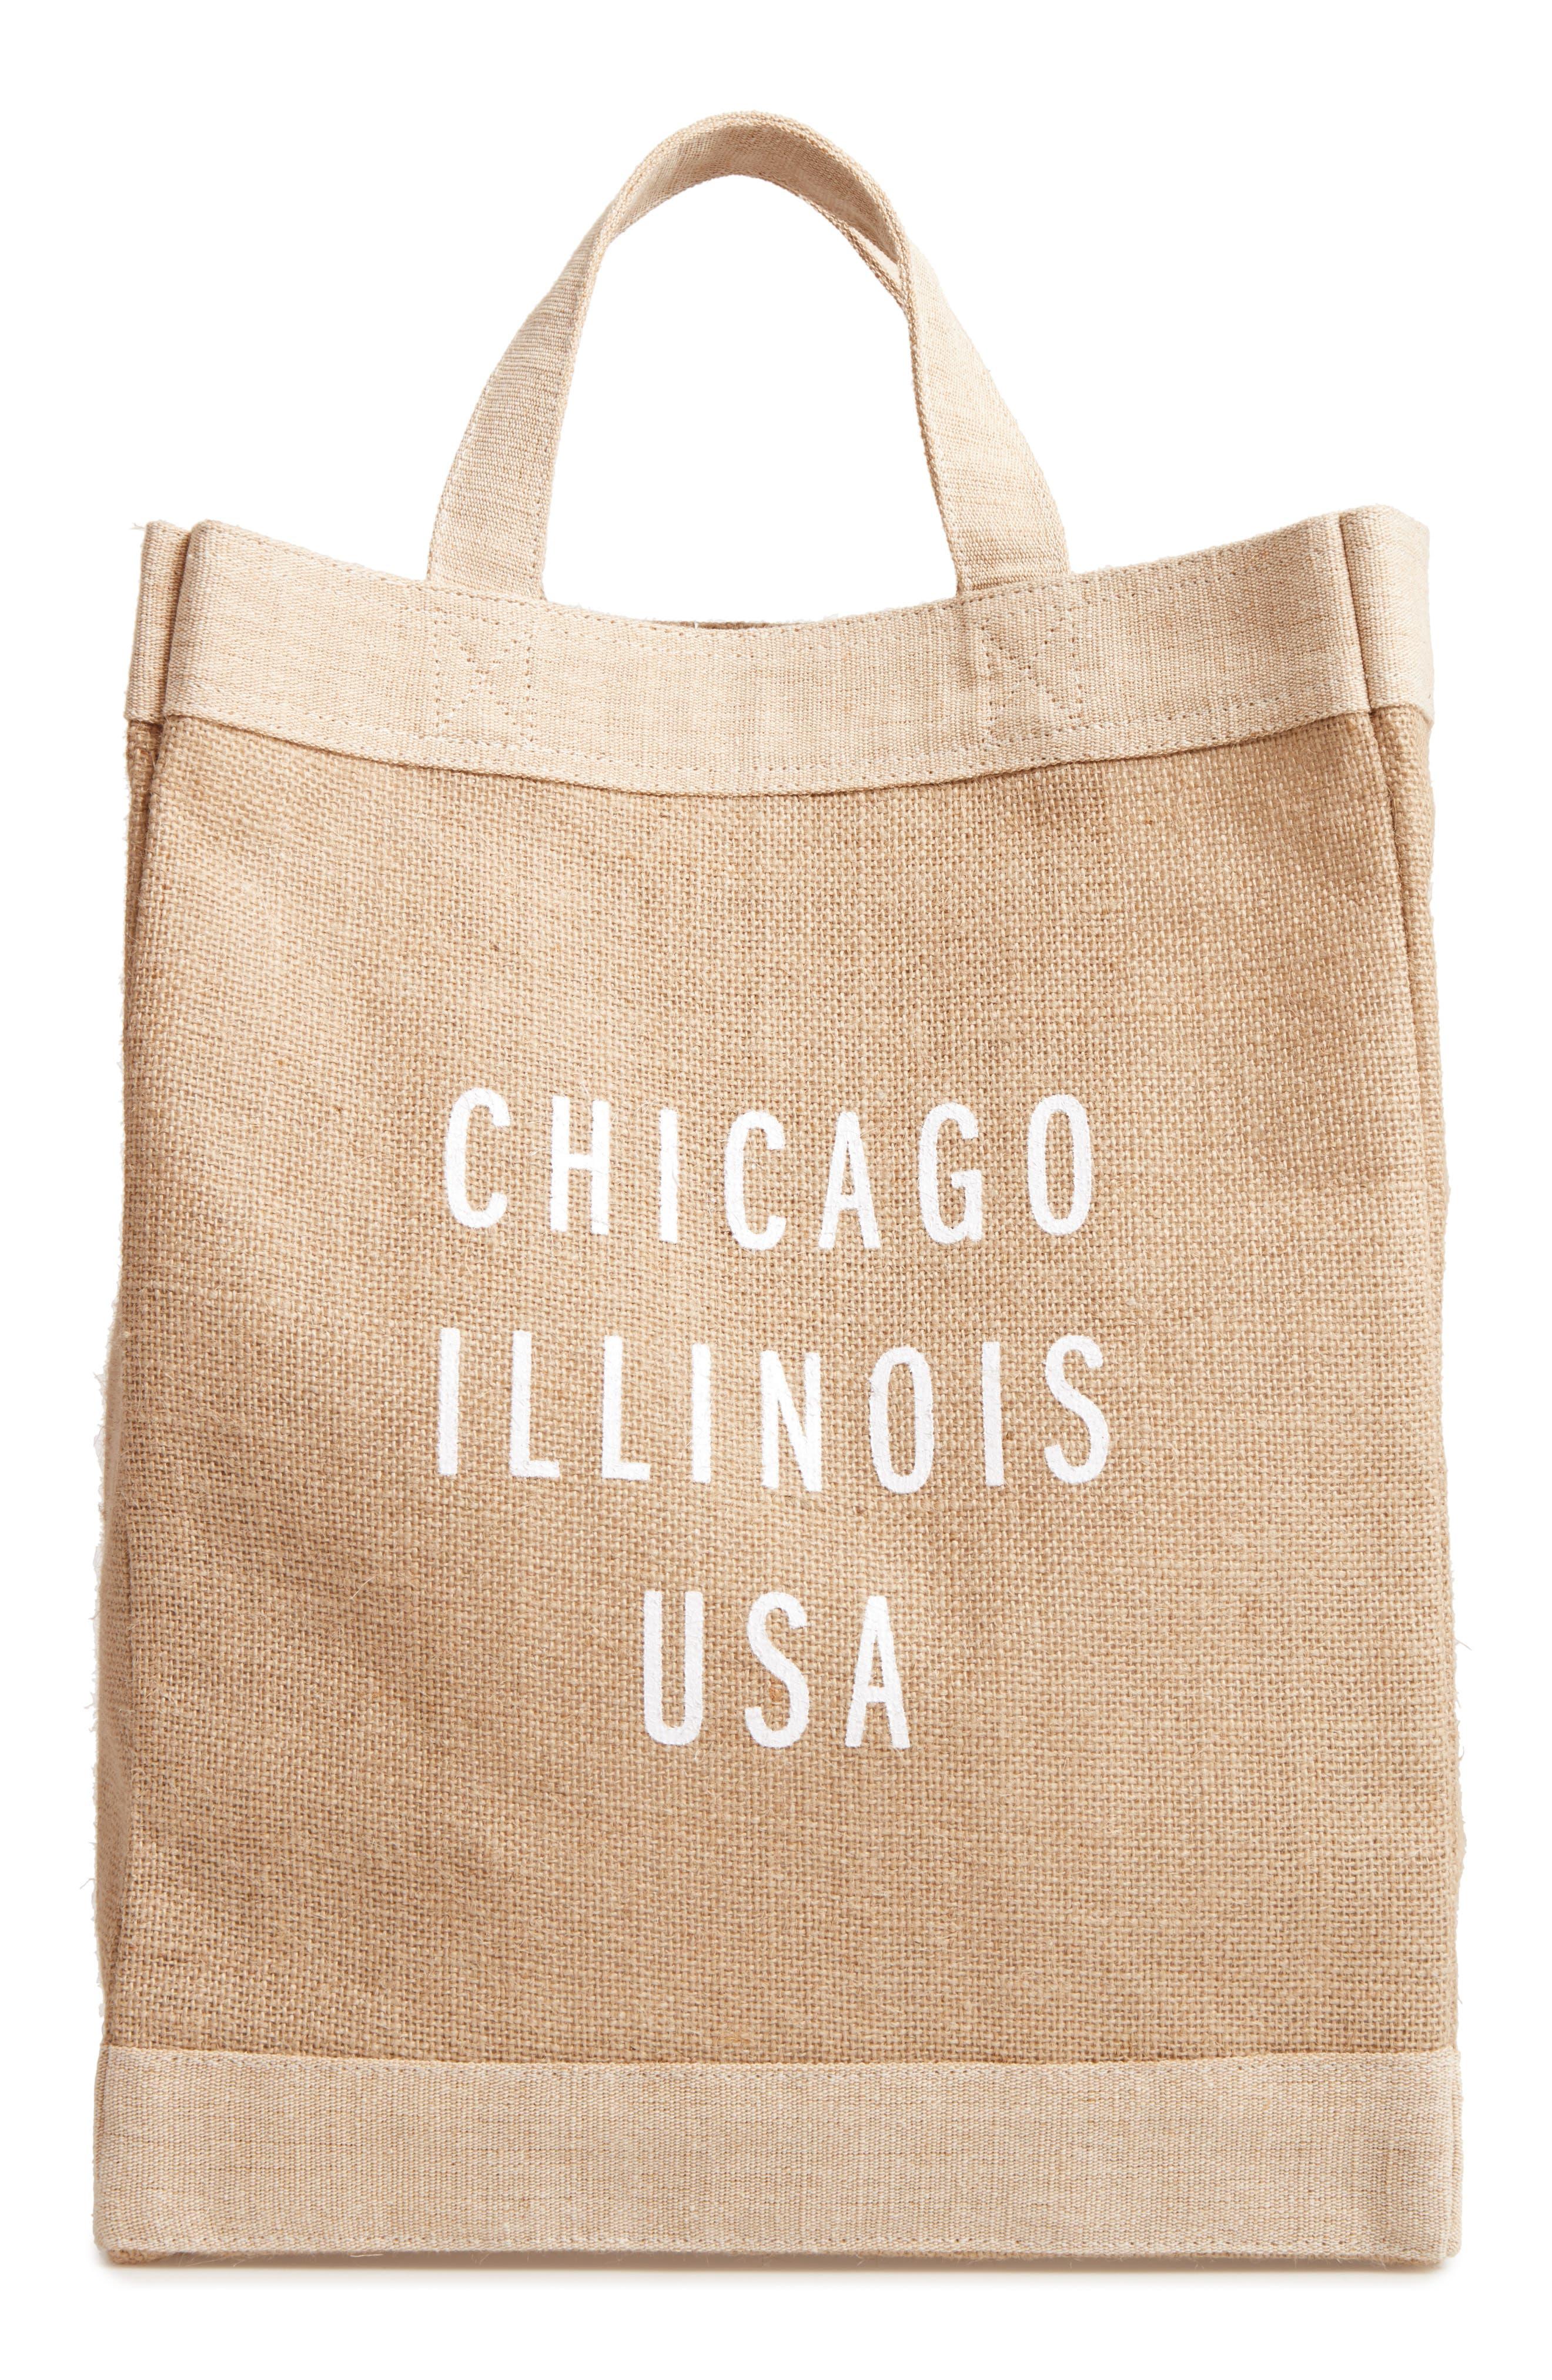 Chicago Simple Market Bag,                             Main thumbnail 1, color,                             Natural